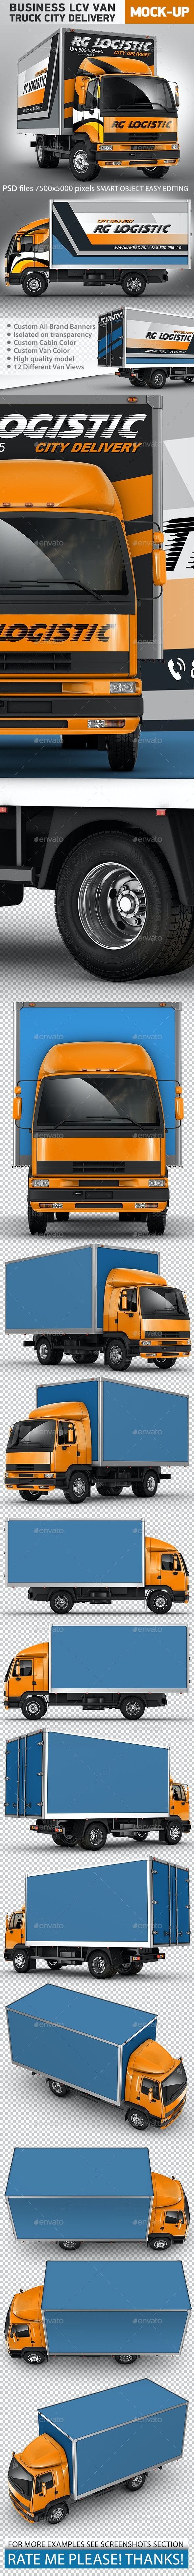 Truck Mock-Up LCV Business Van City Delivery - Vehicle Wraps Print